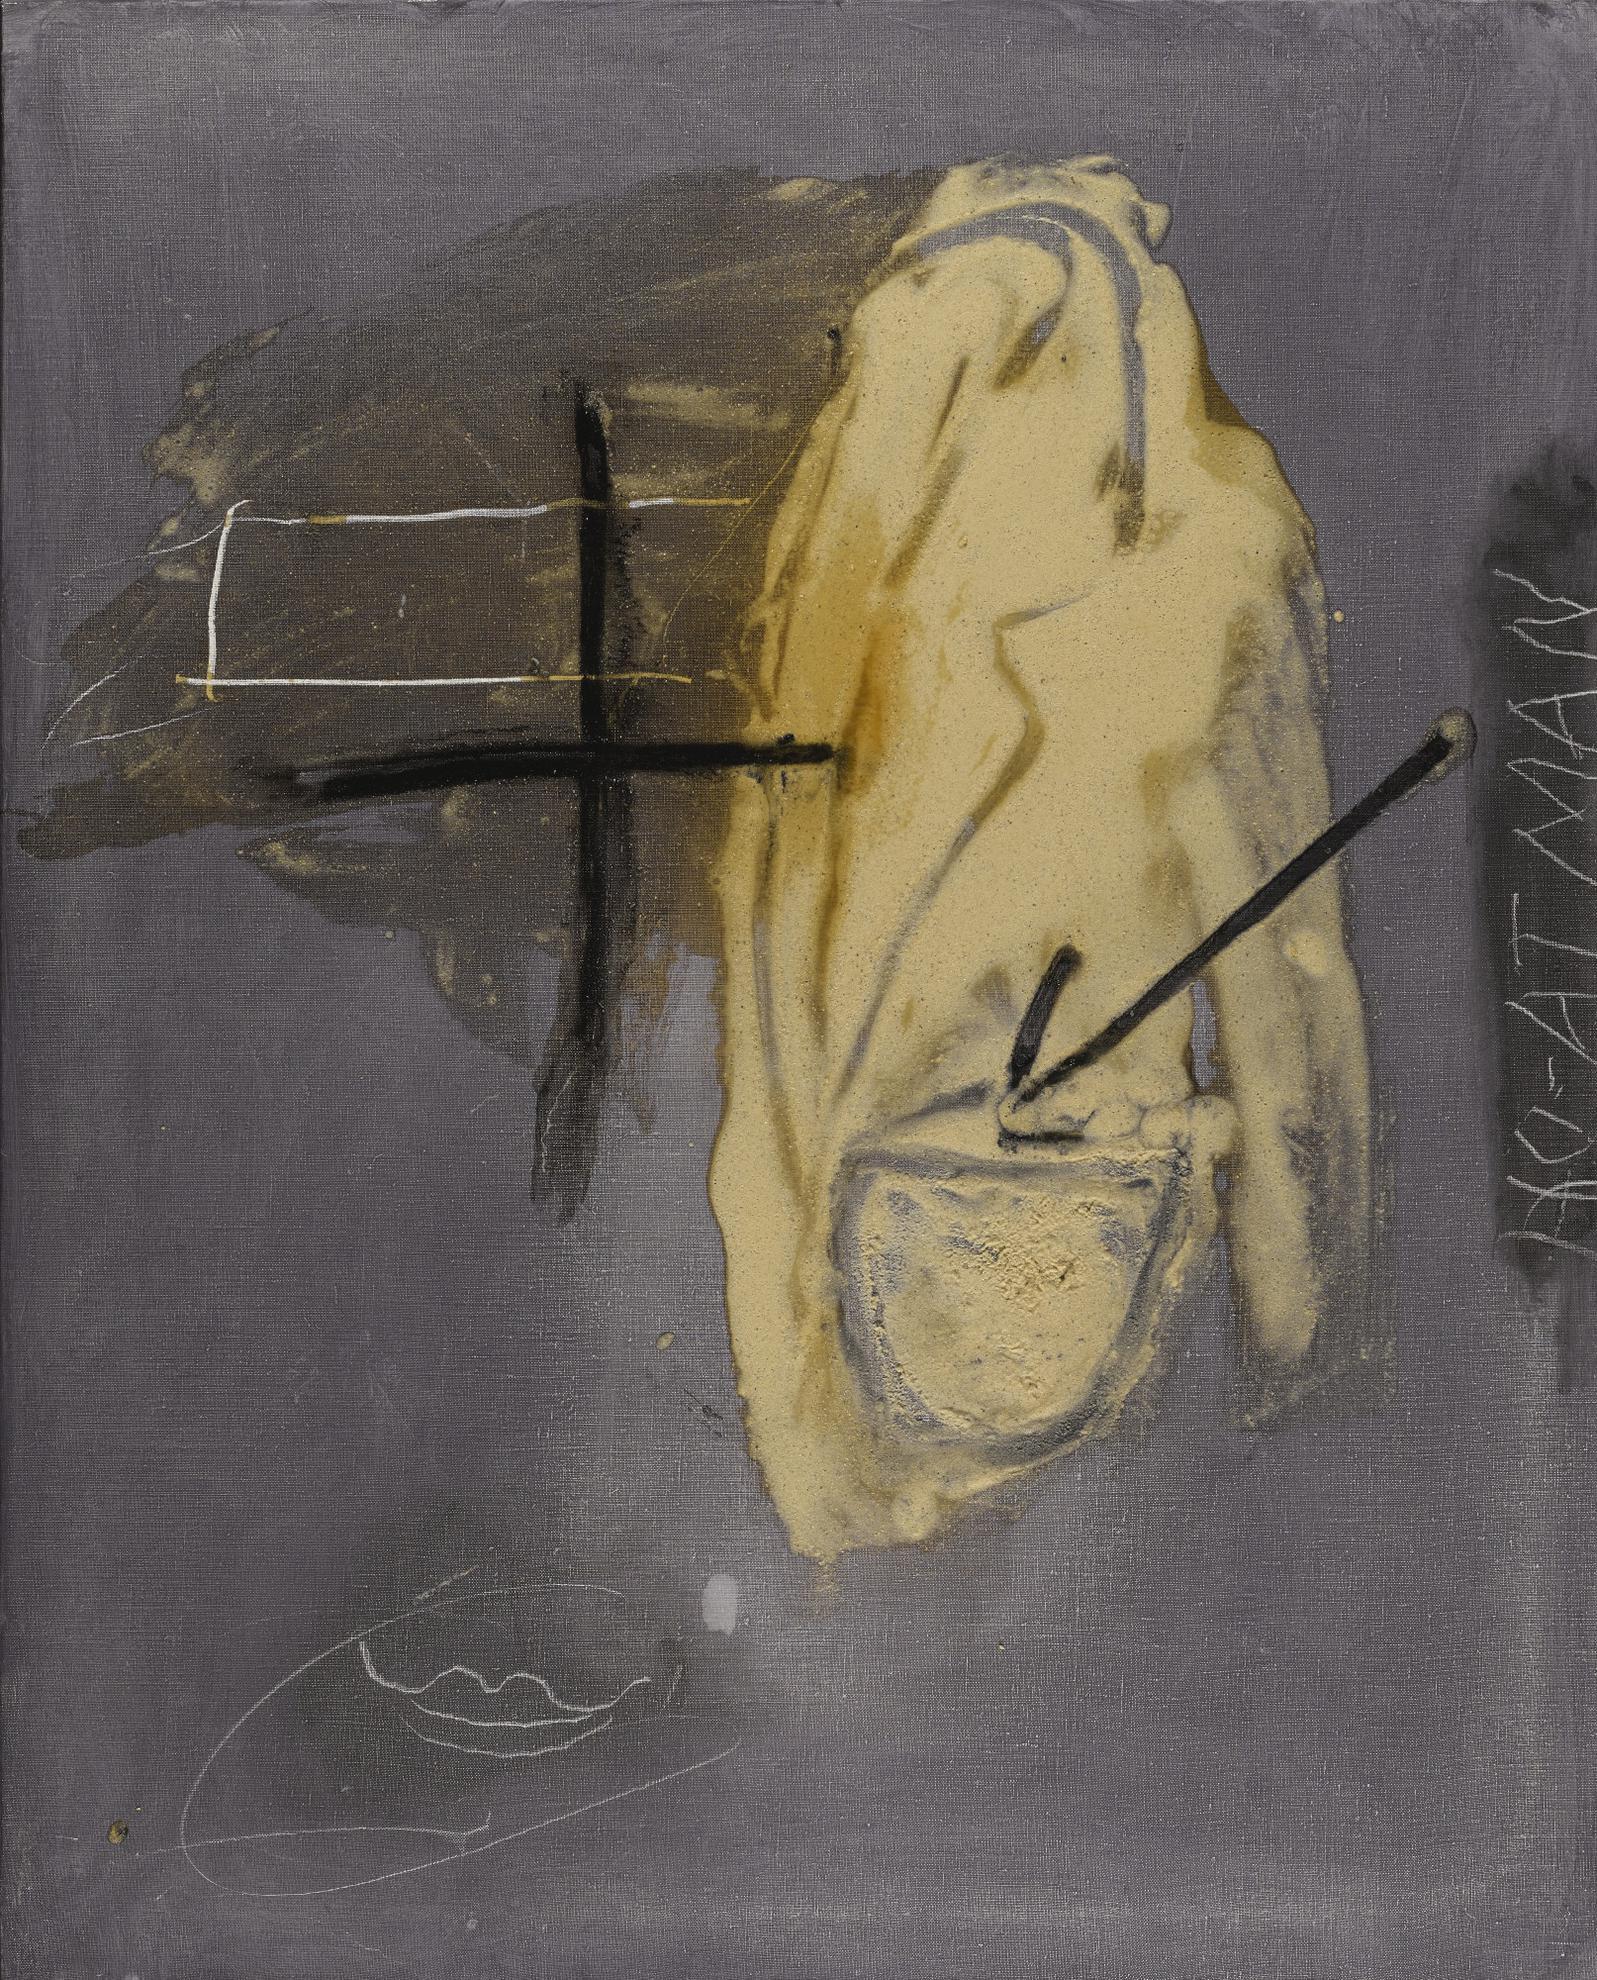 Antoni Tapies-No-Atman-2001